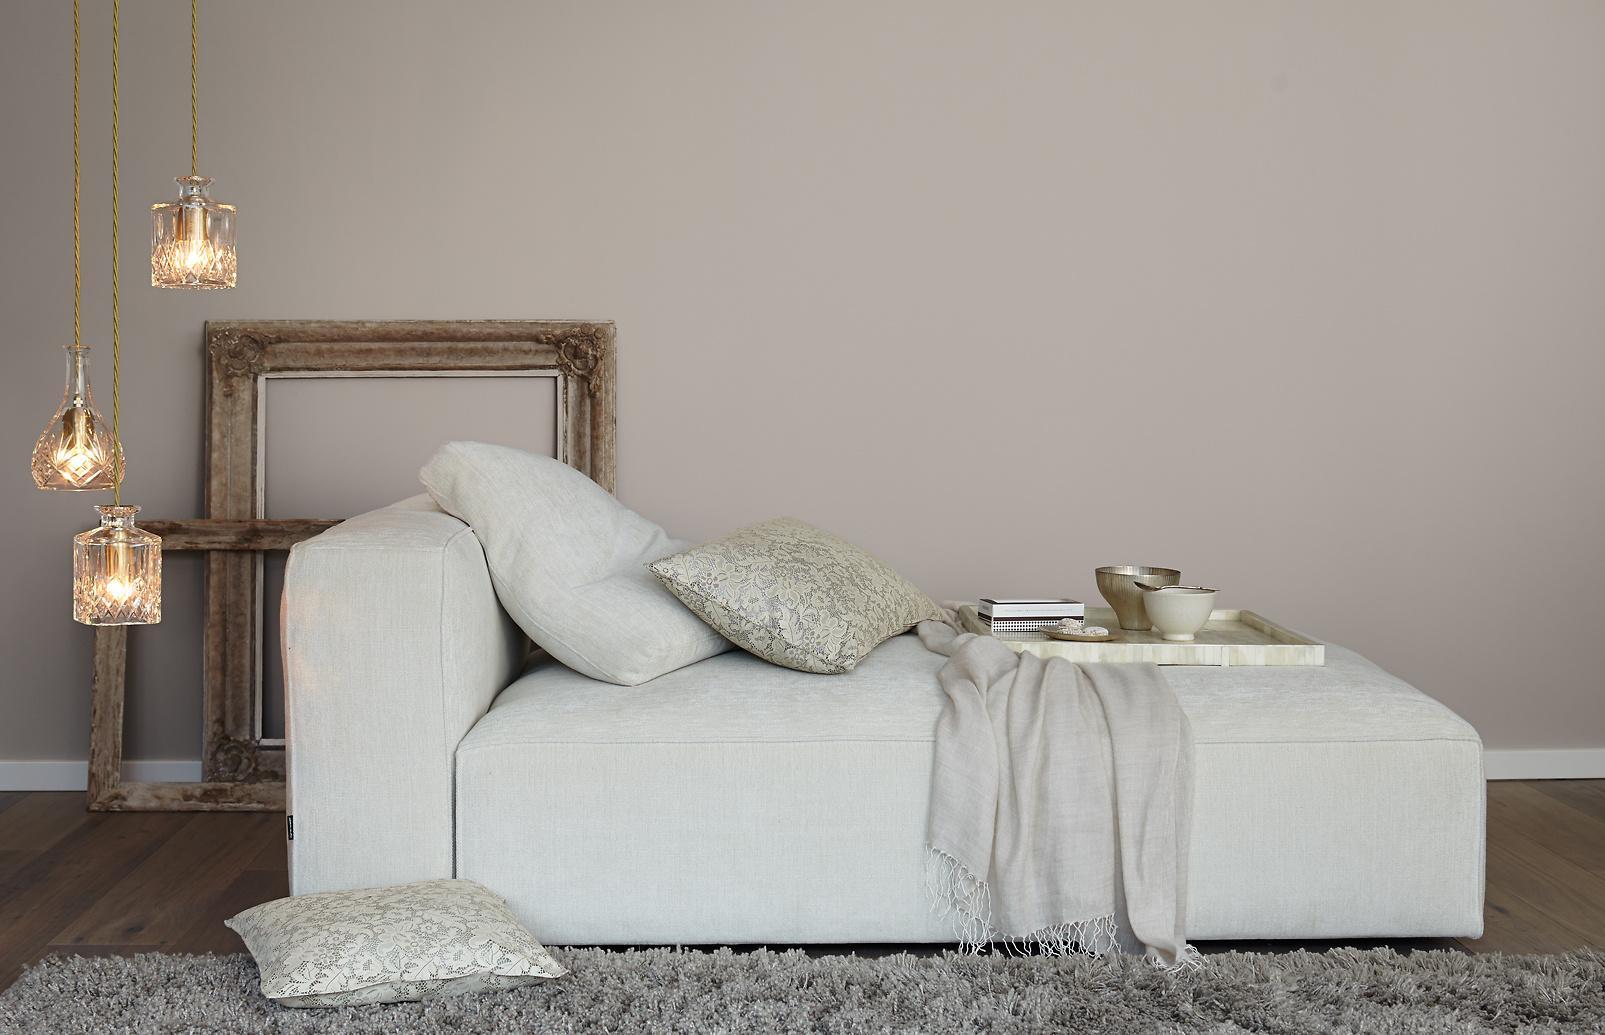 Schlafzimmer Wandfarbe Grau Braun